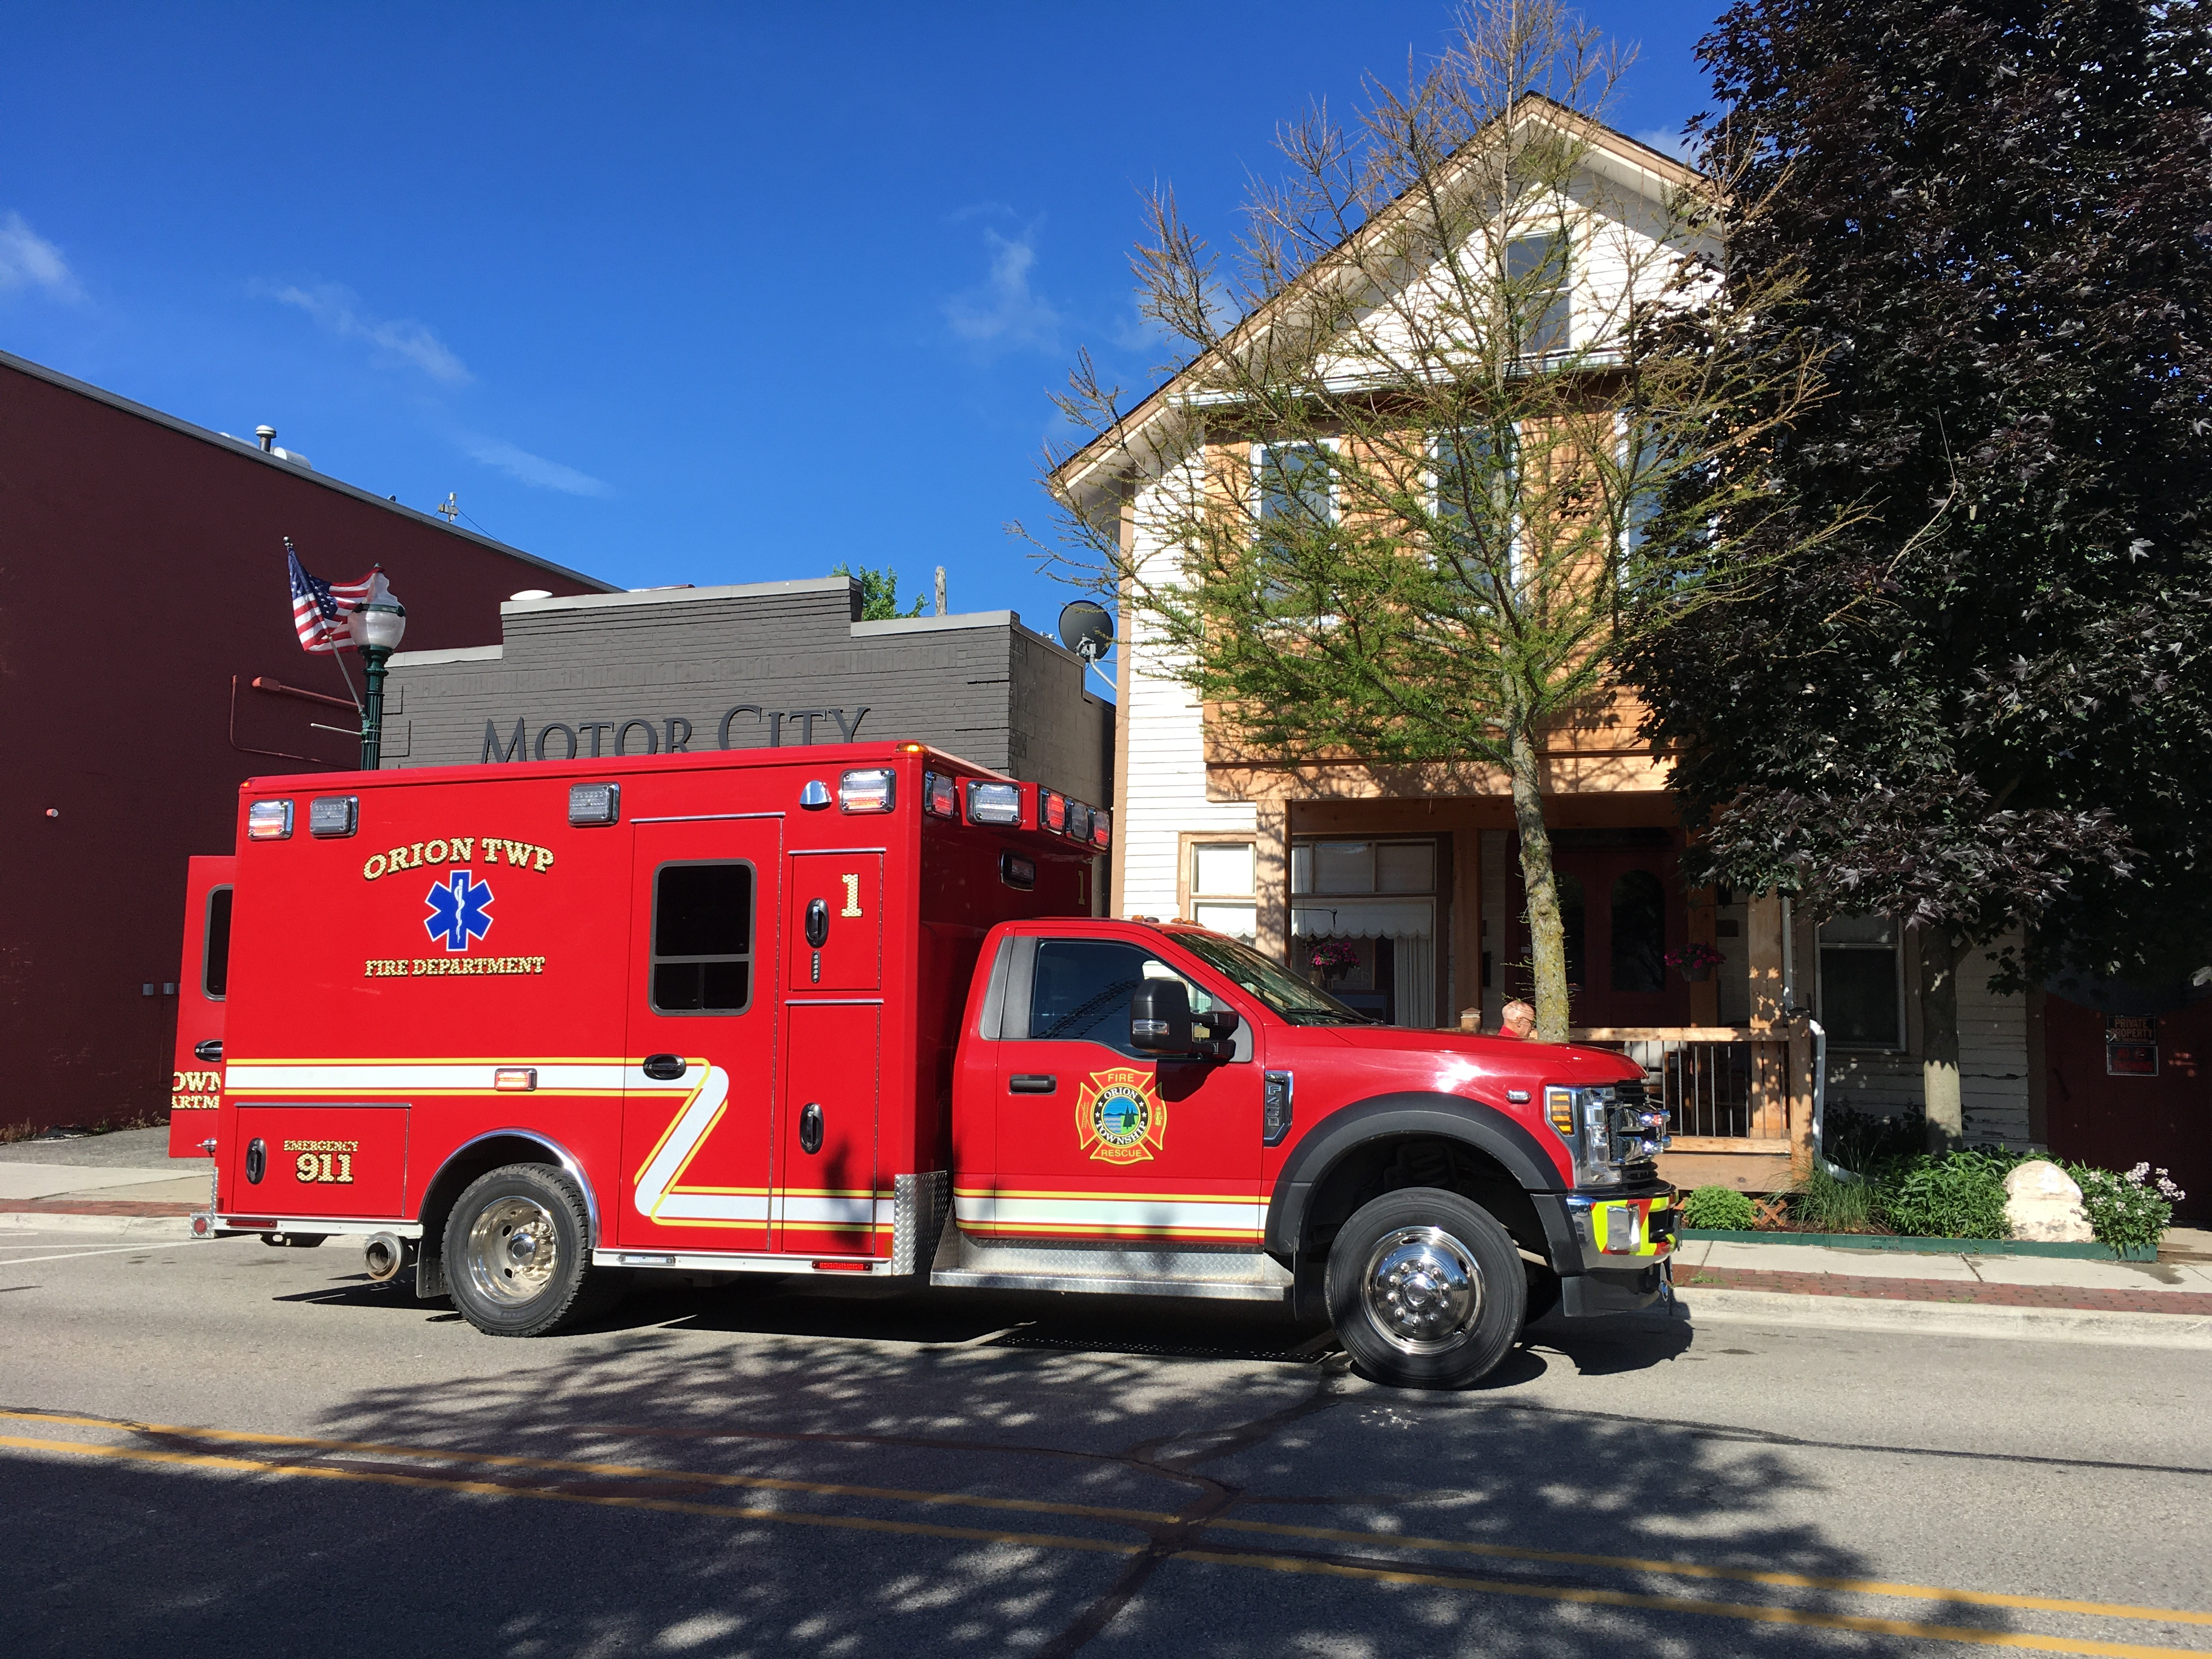 Orion fire ambulance